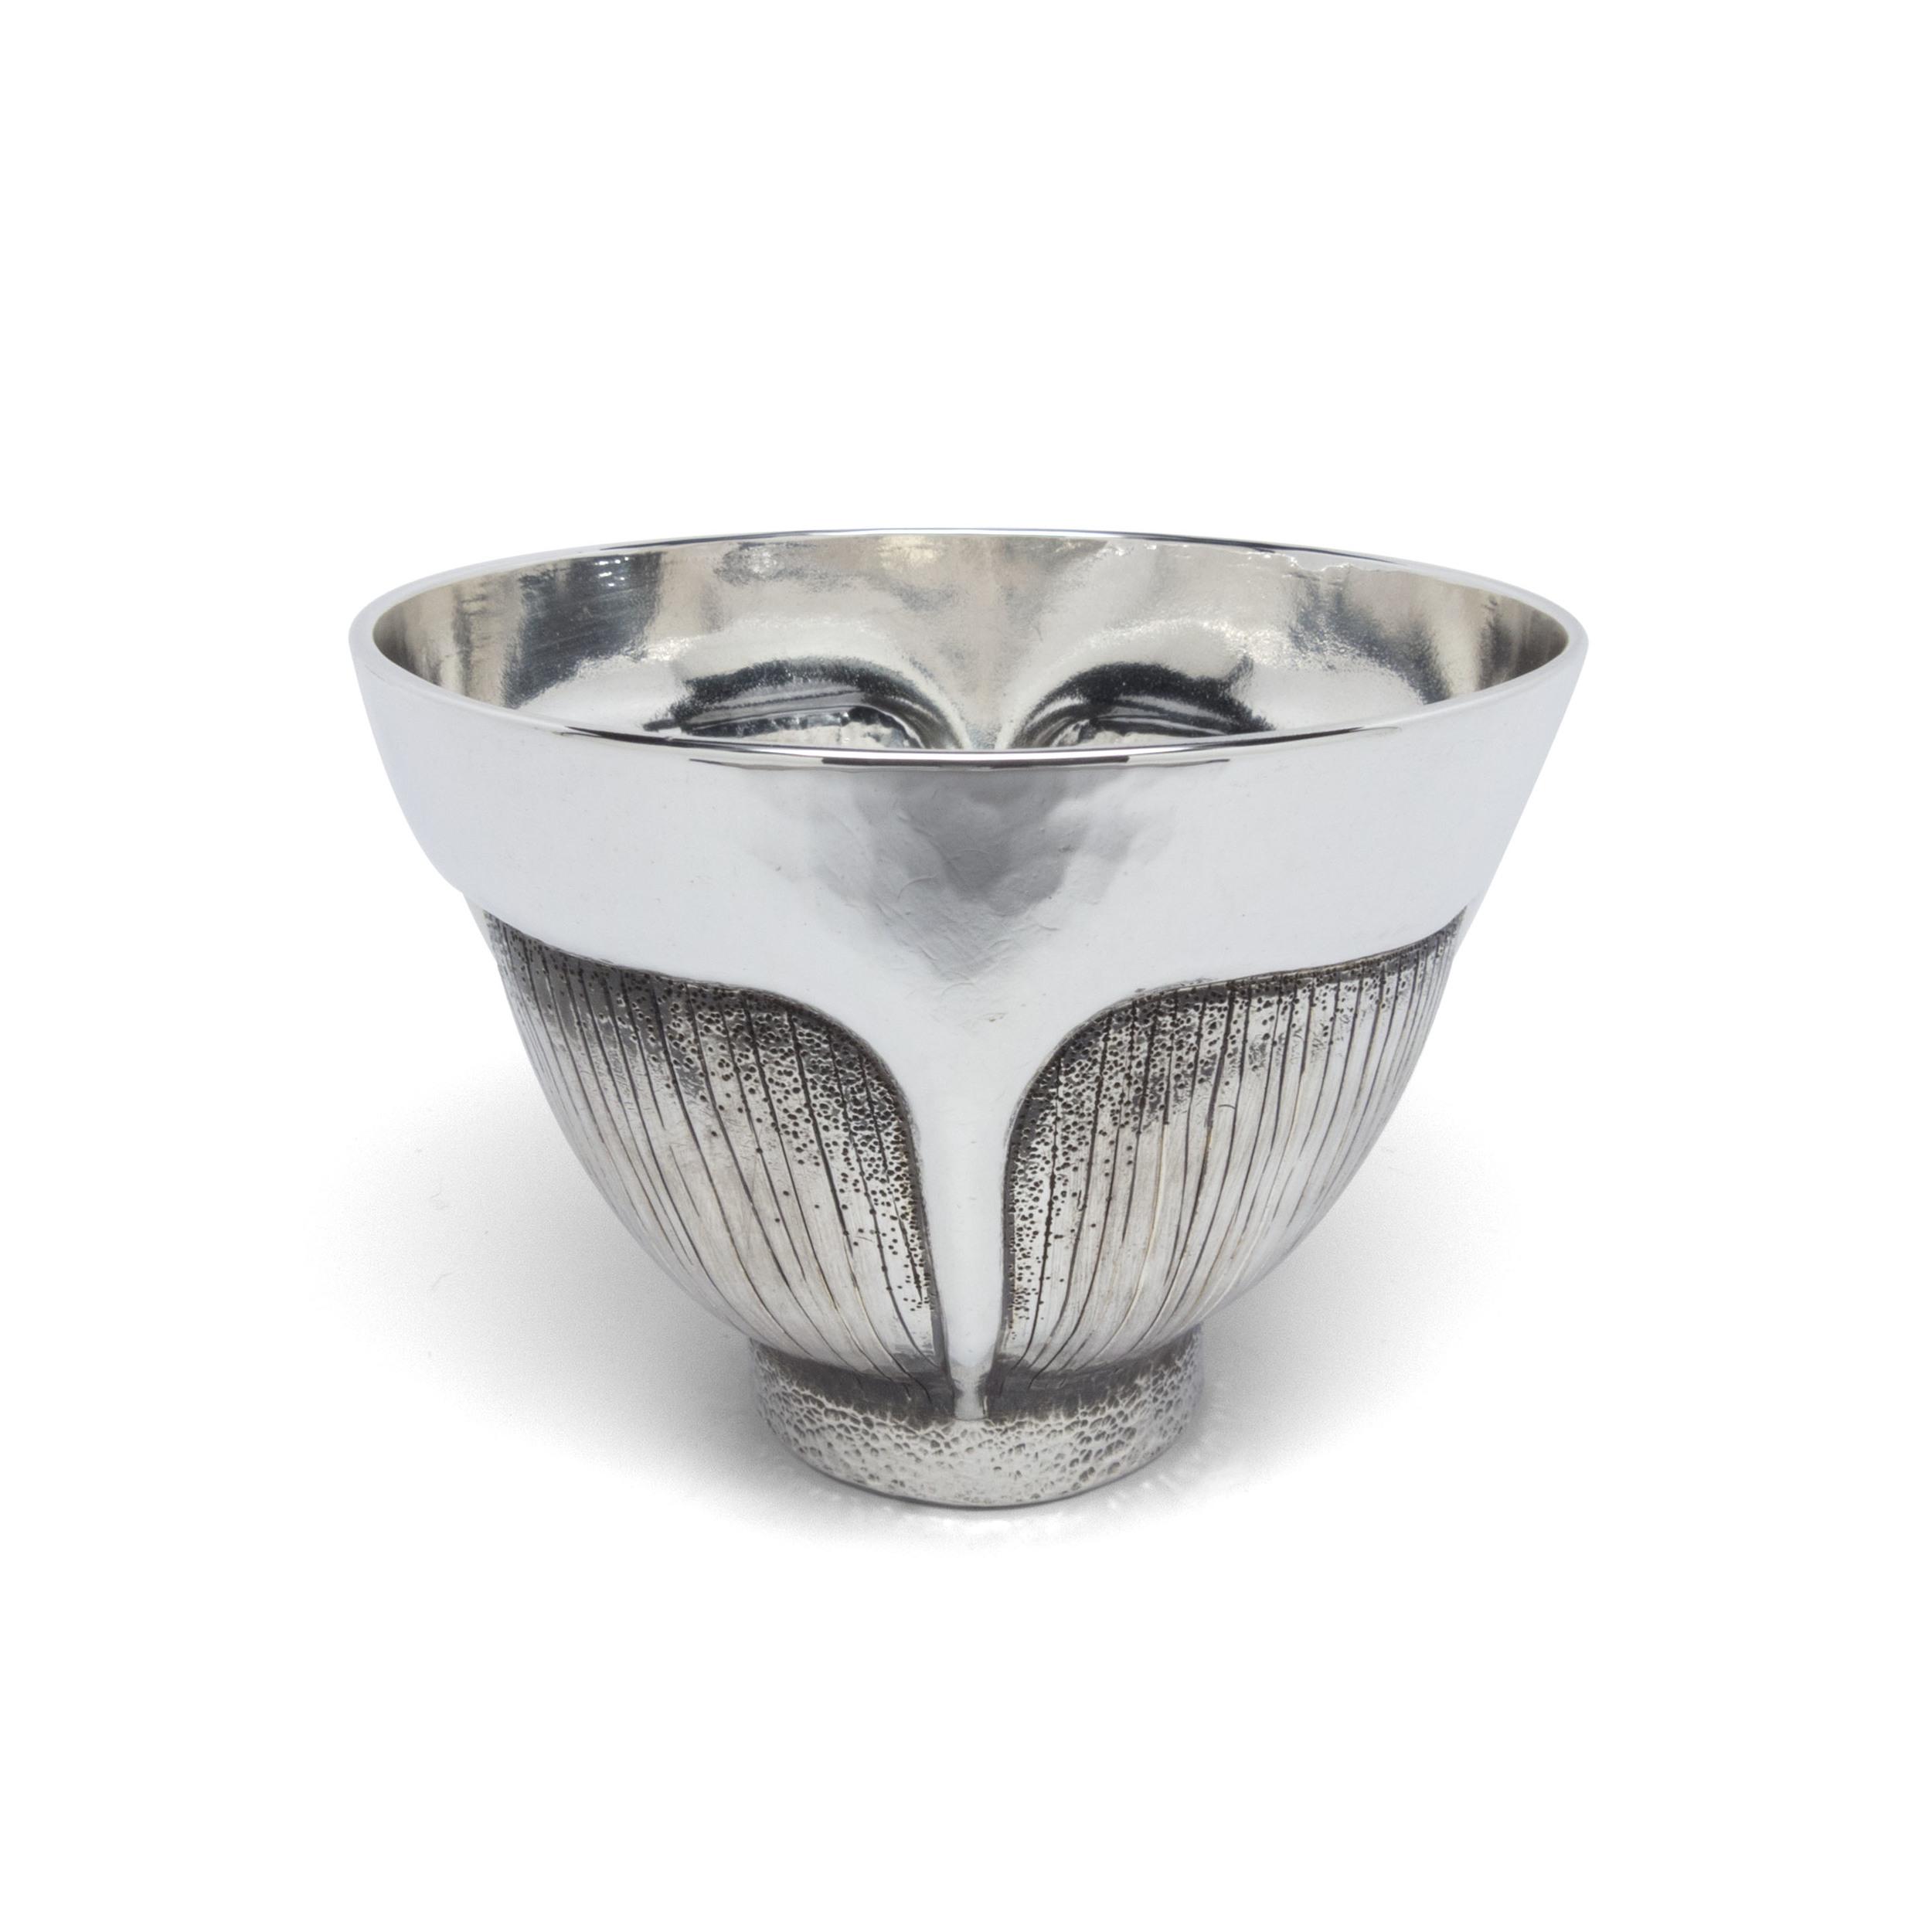 Quadrant - Cup